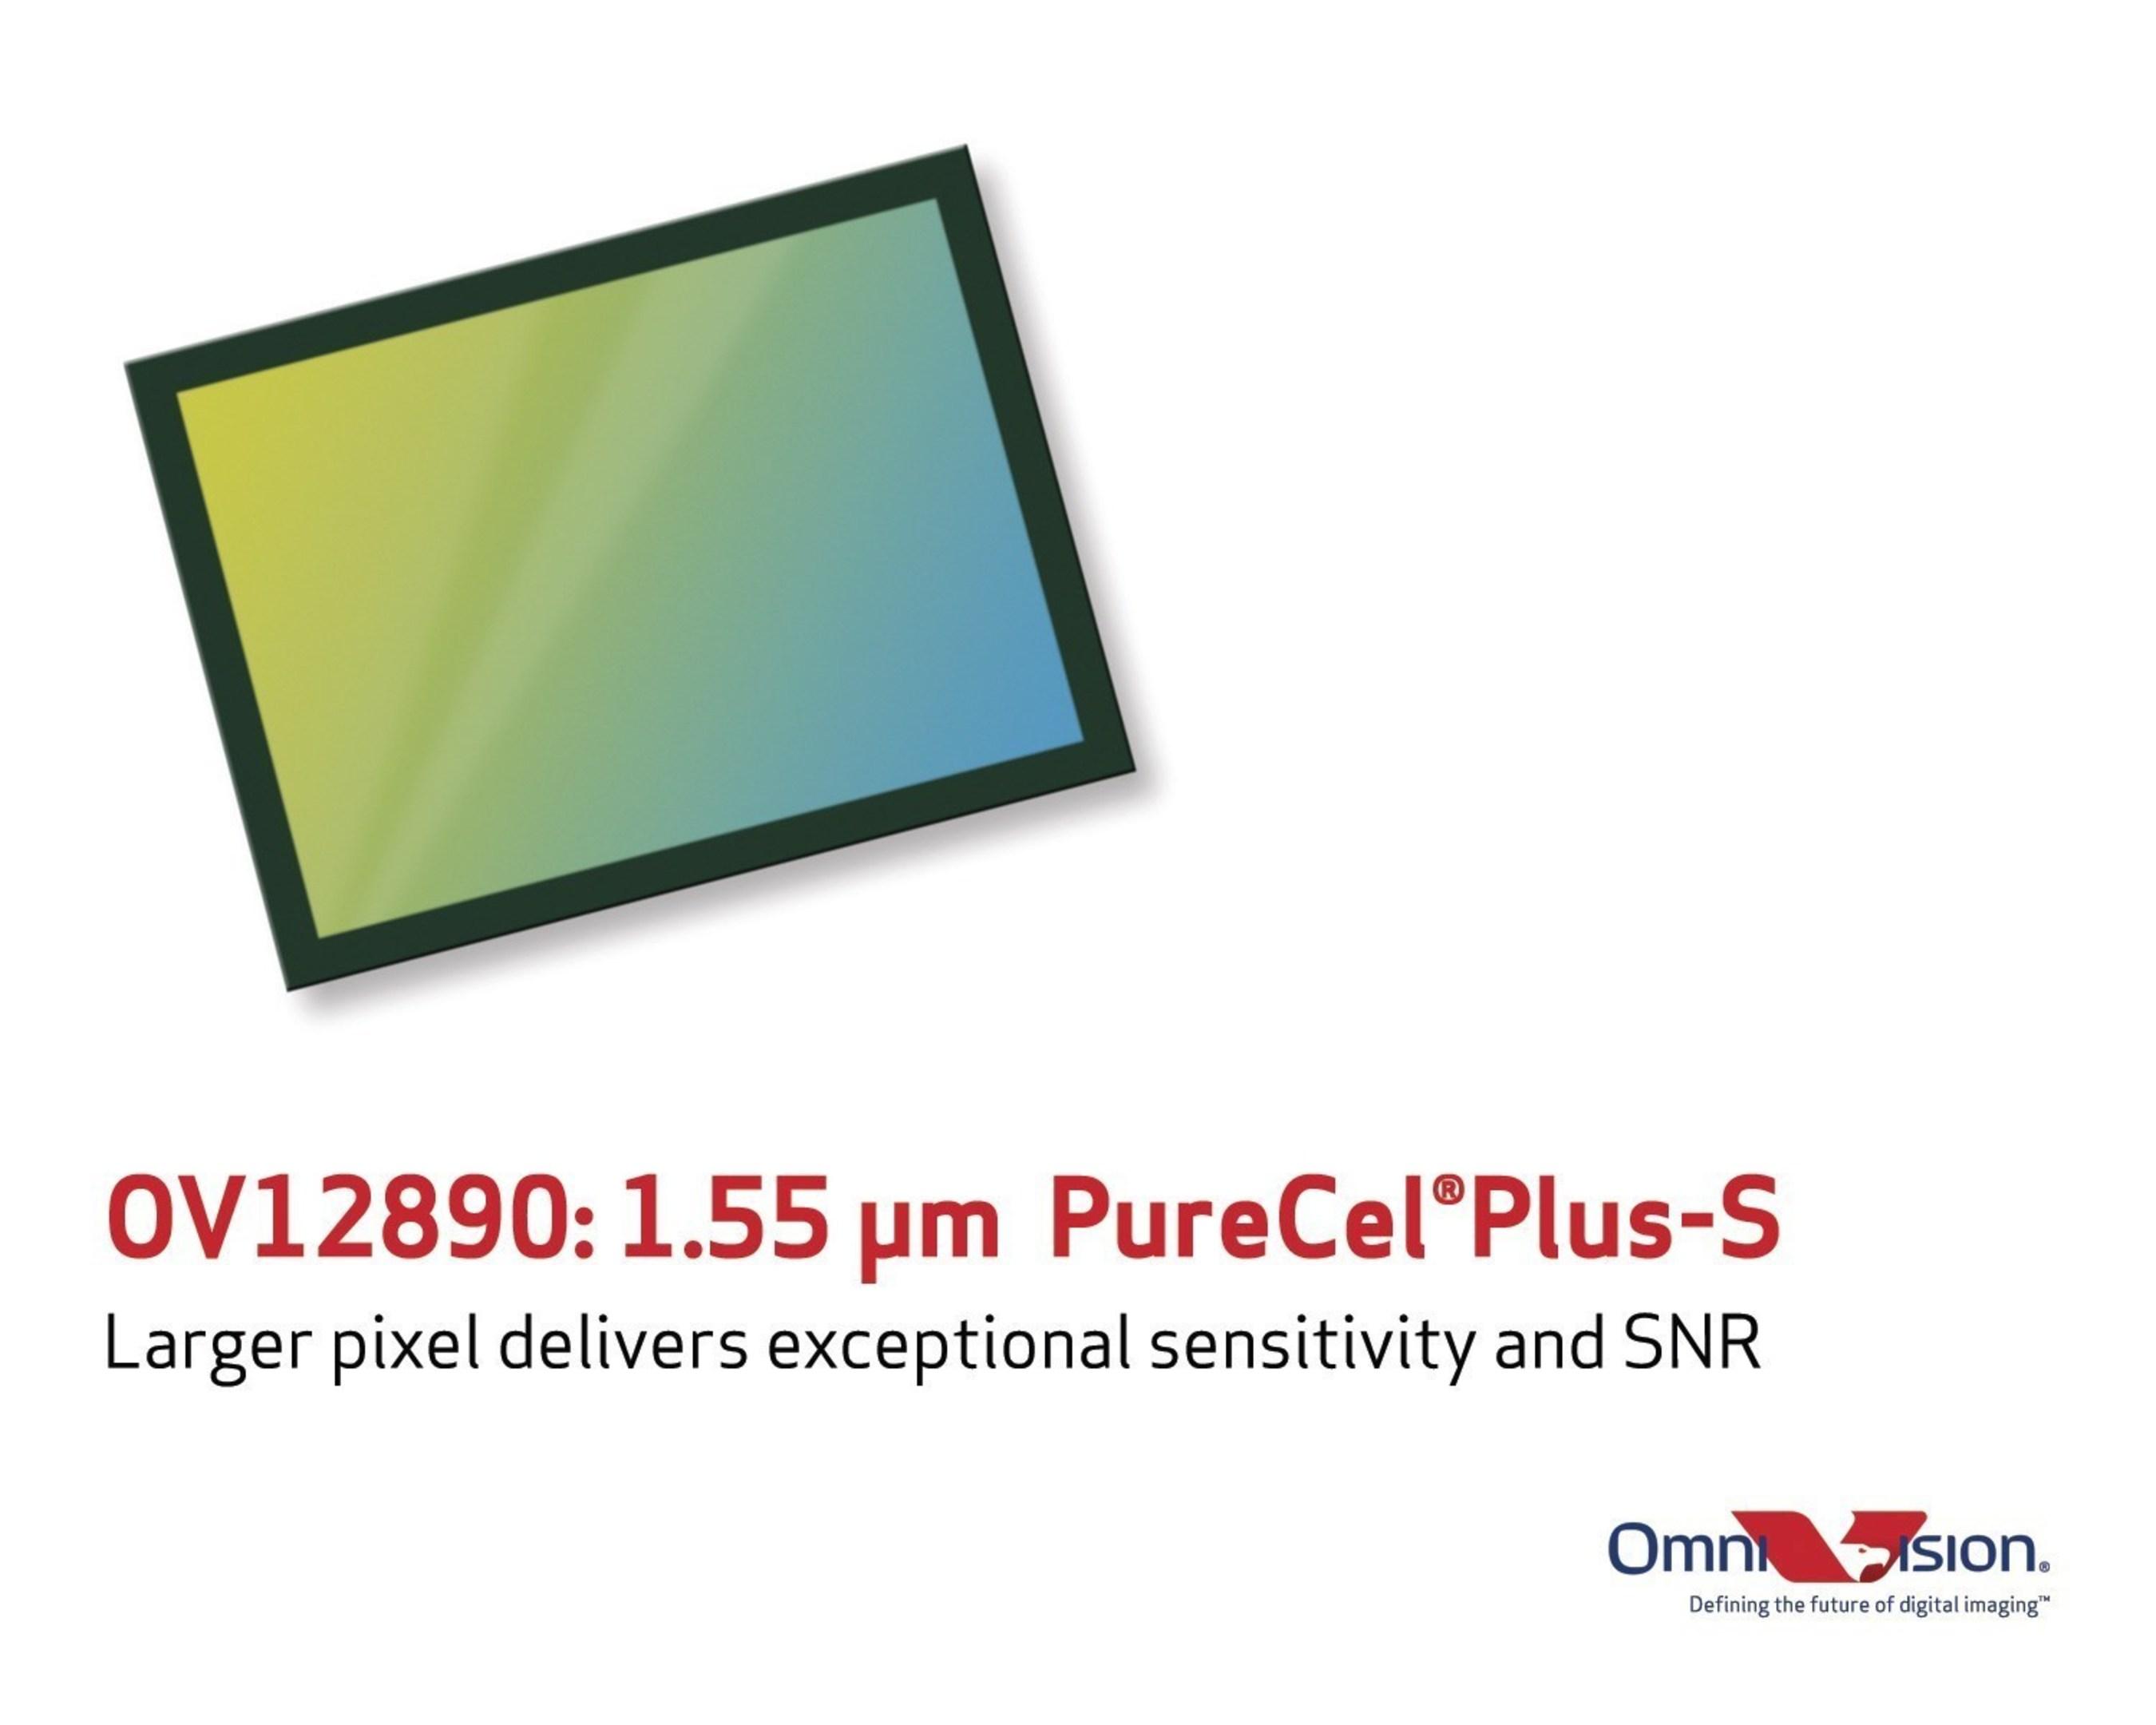 OmniVision's OV12890 PureCel(R)Plus-S sensor